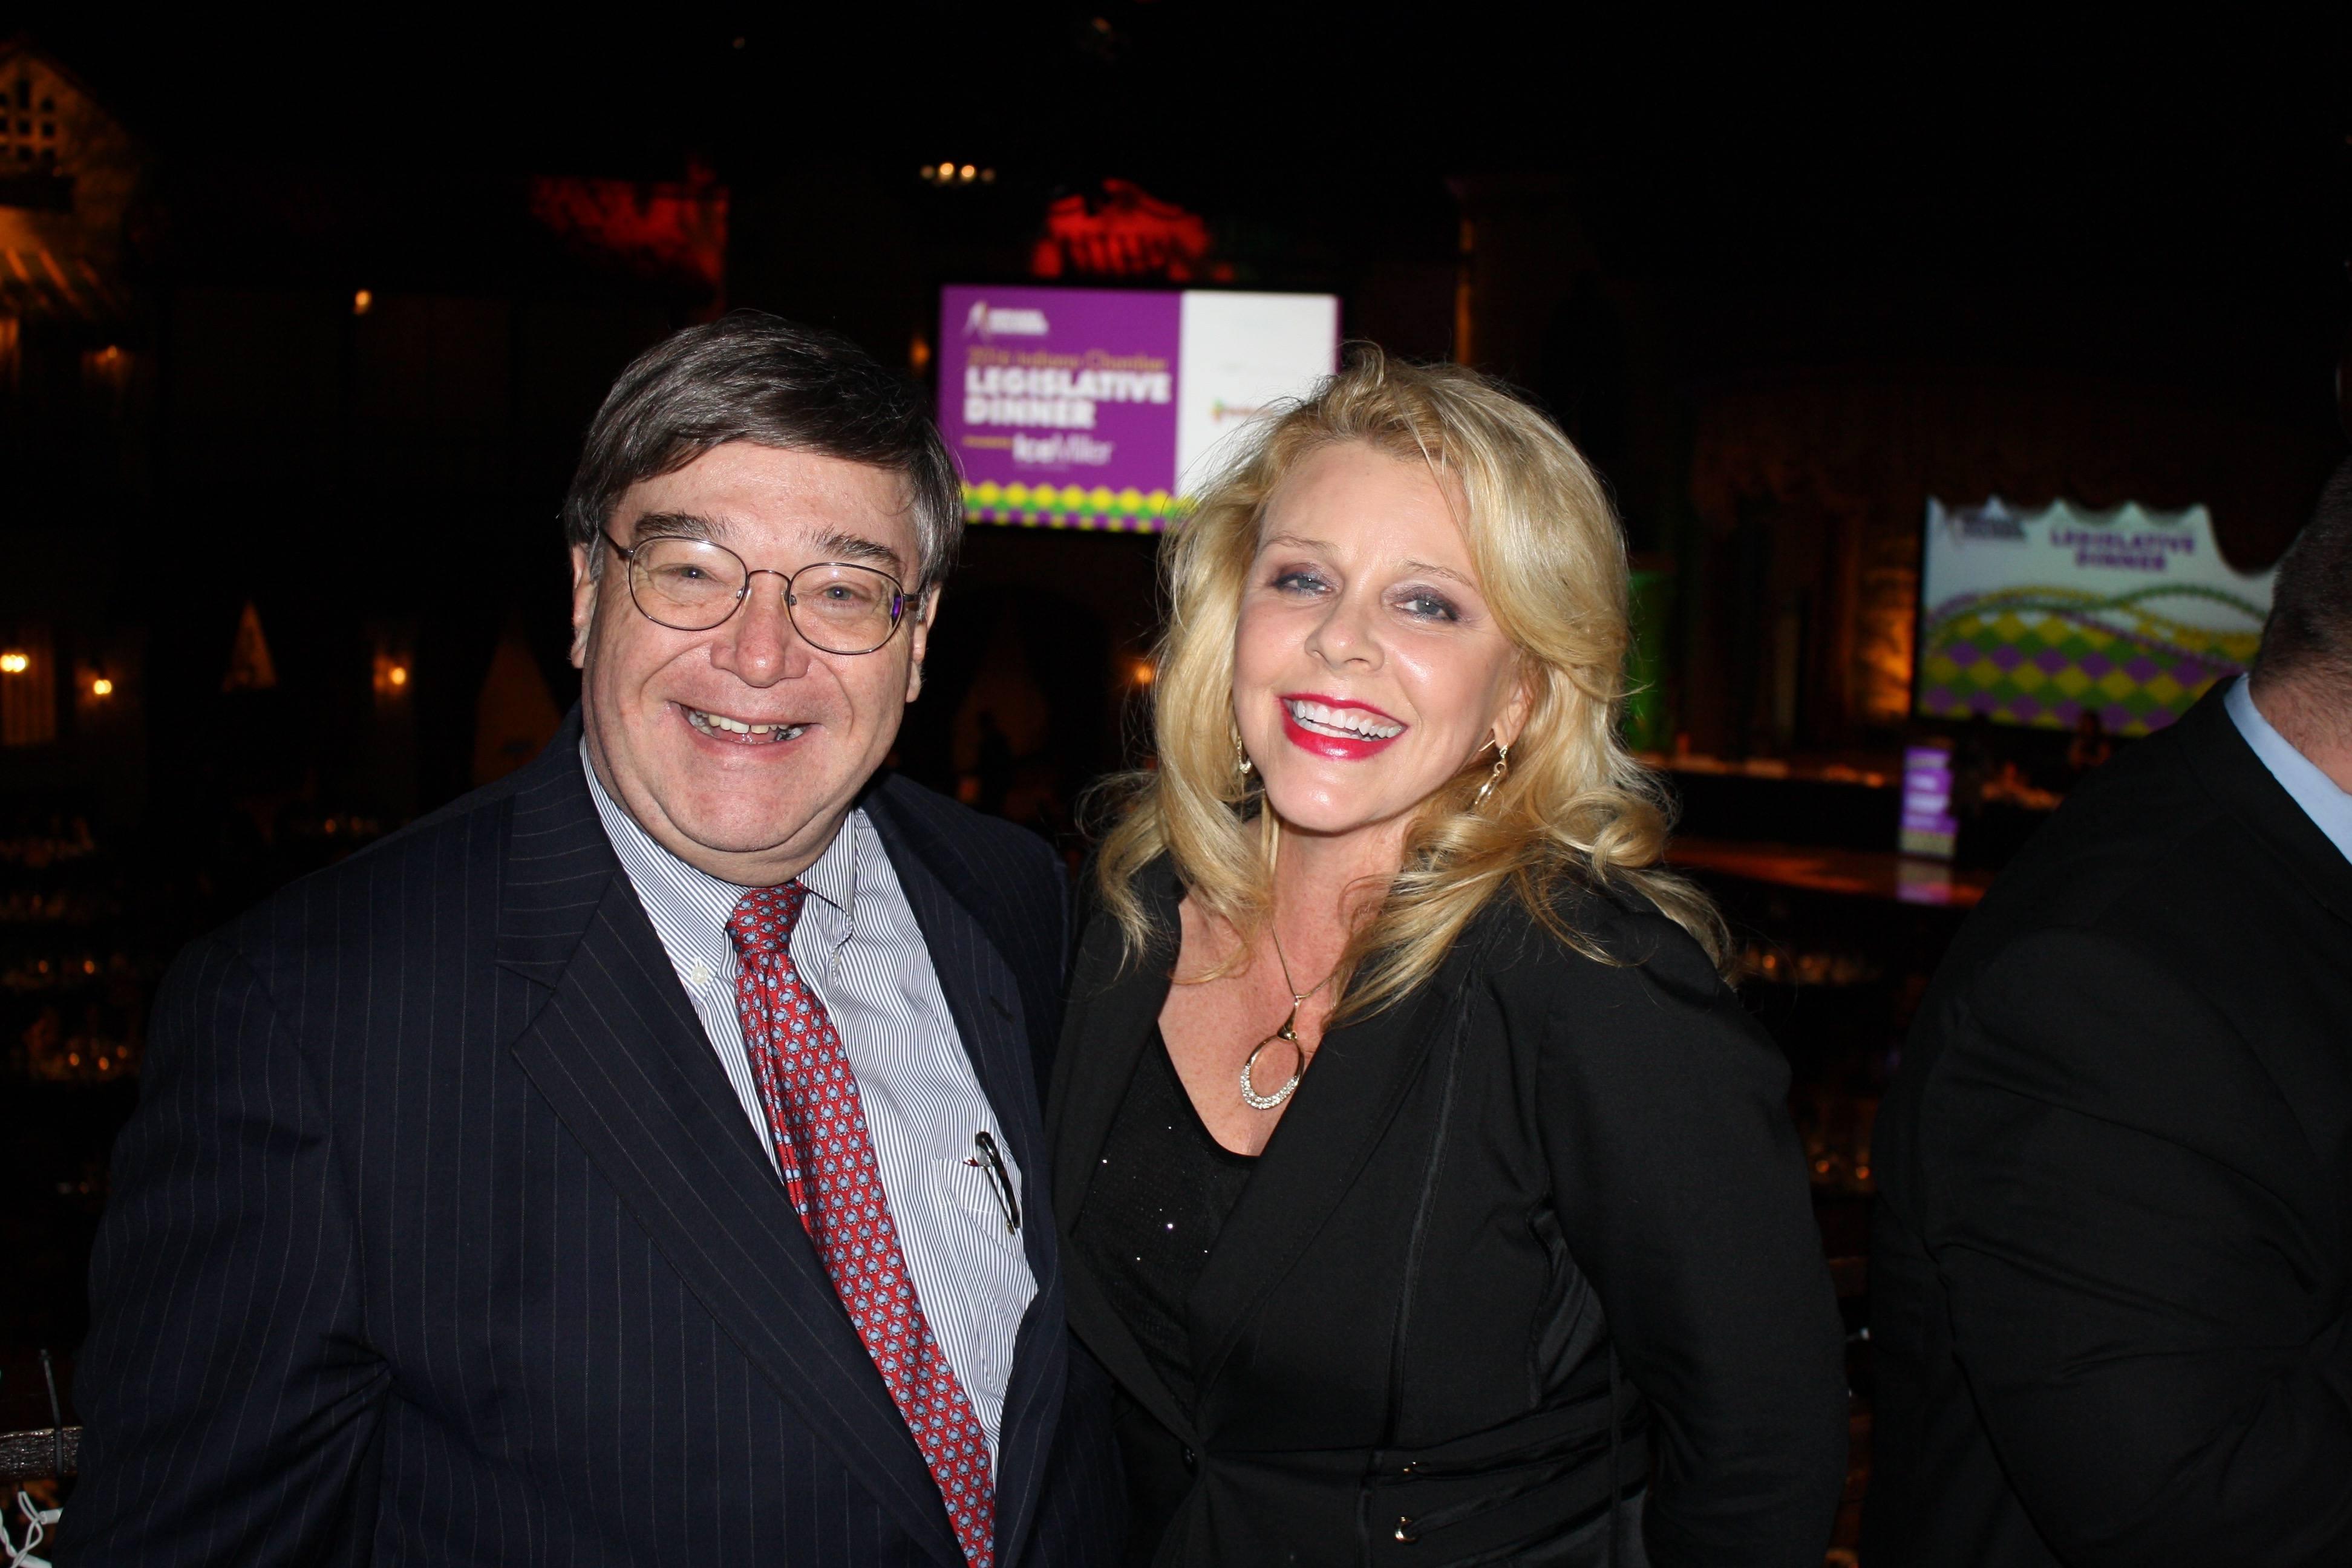 Charlie Cook and Dana Carroll